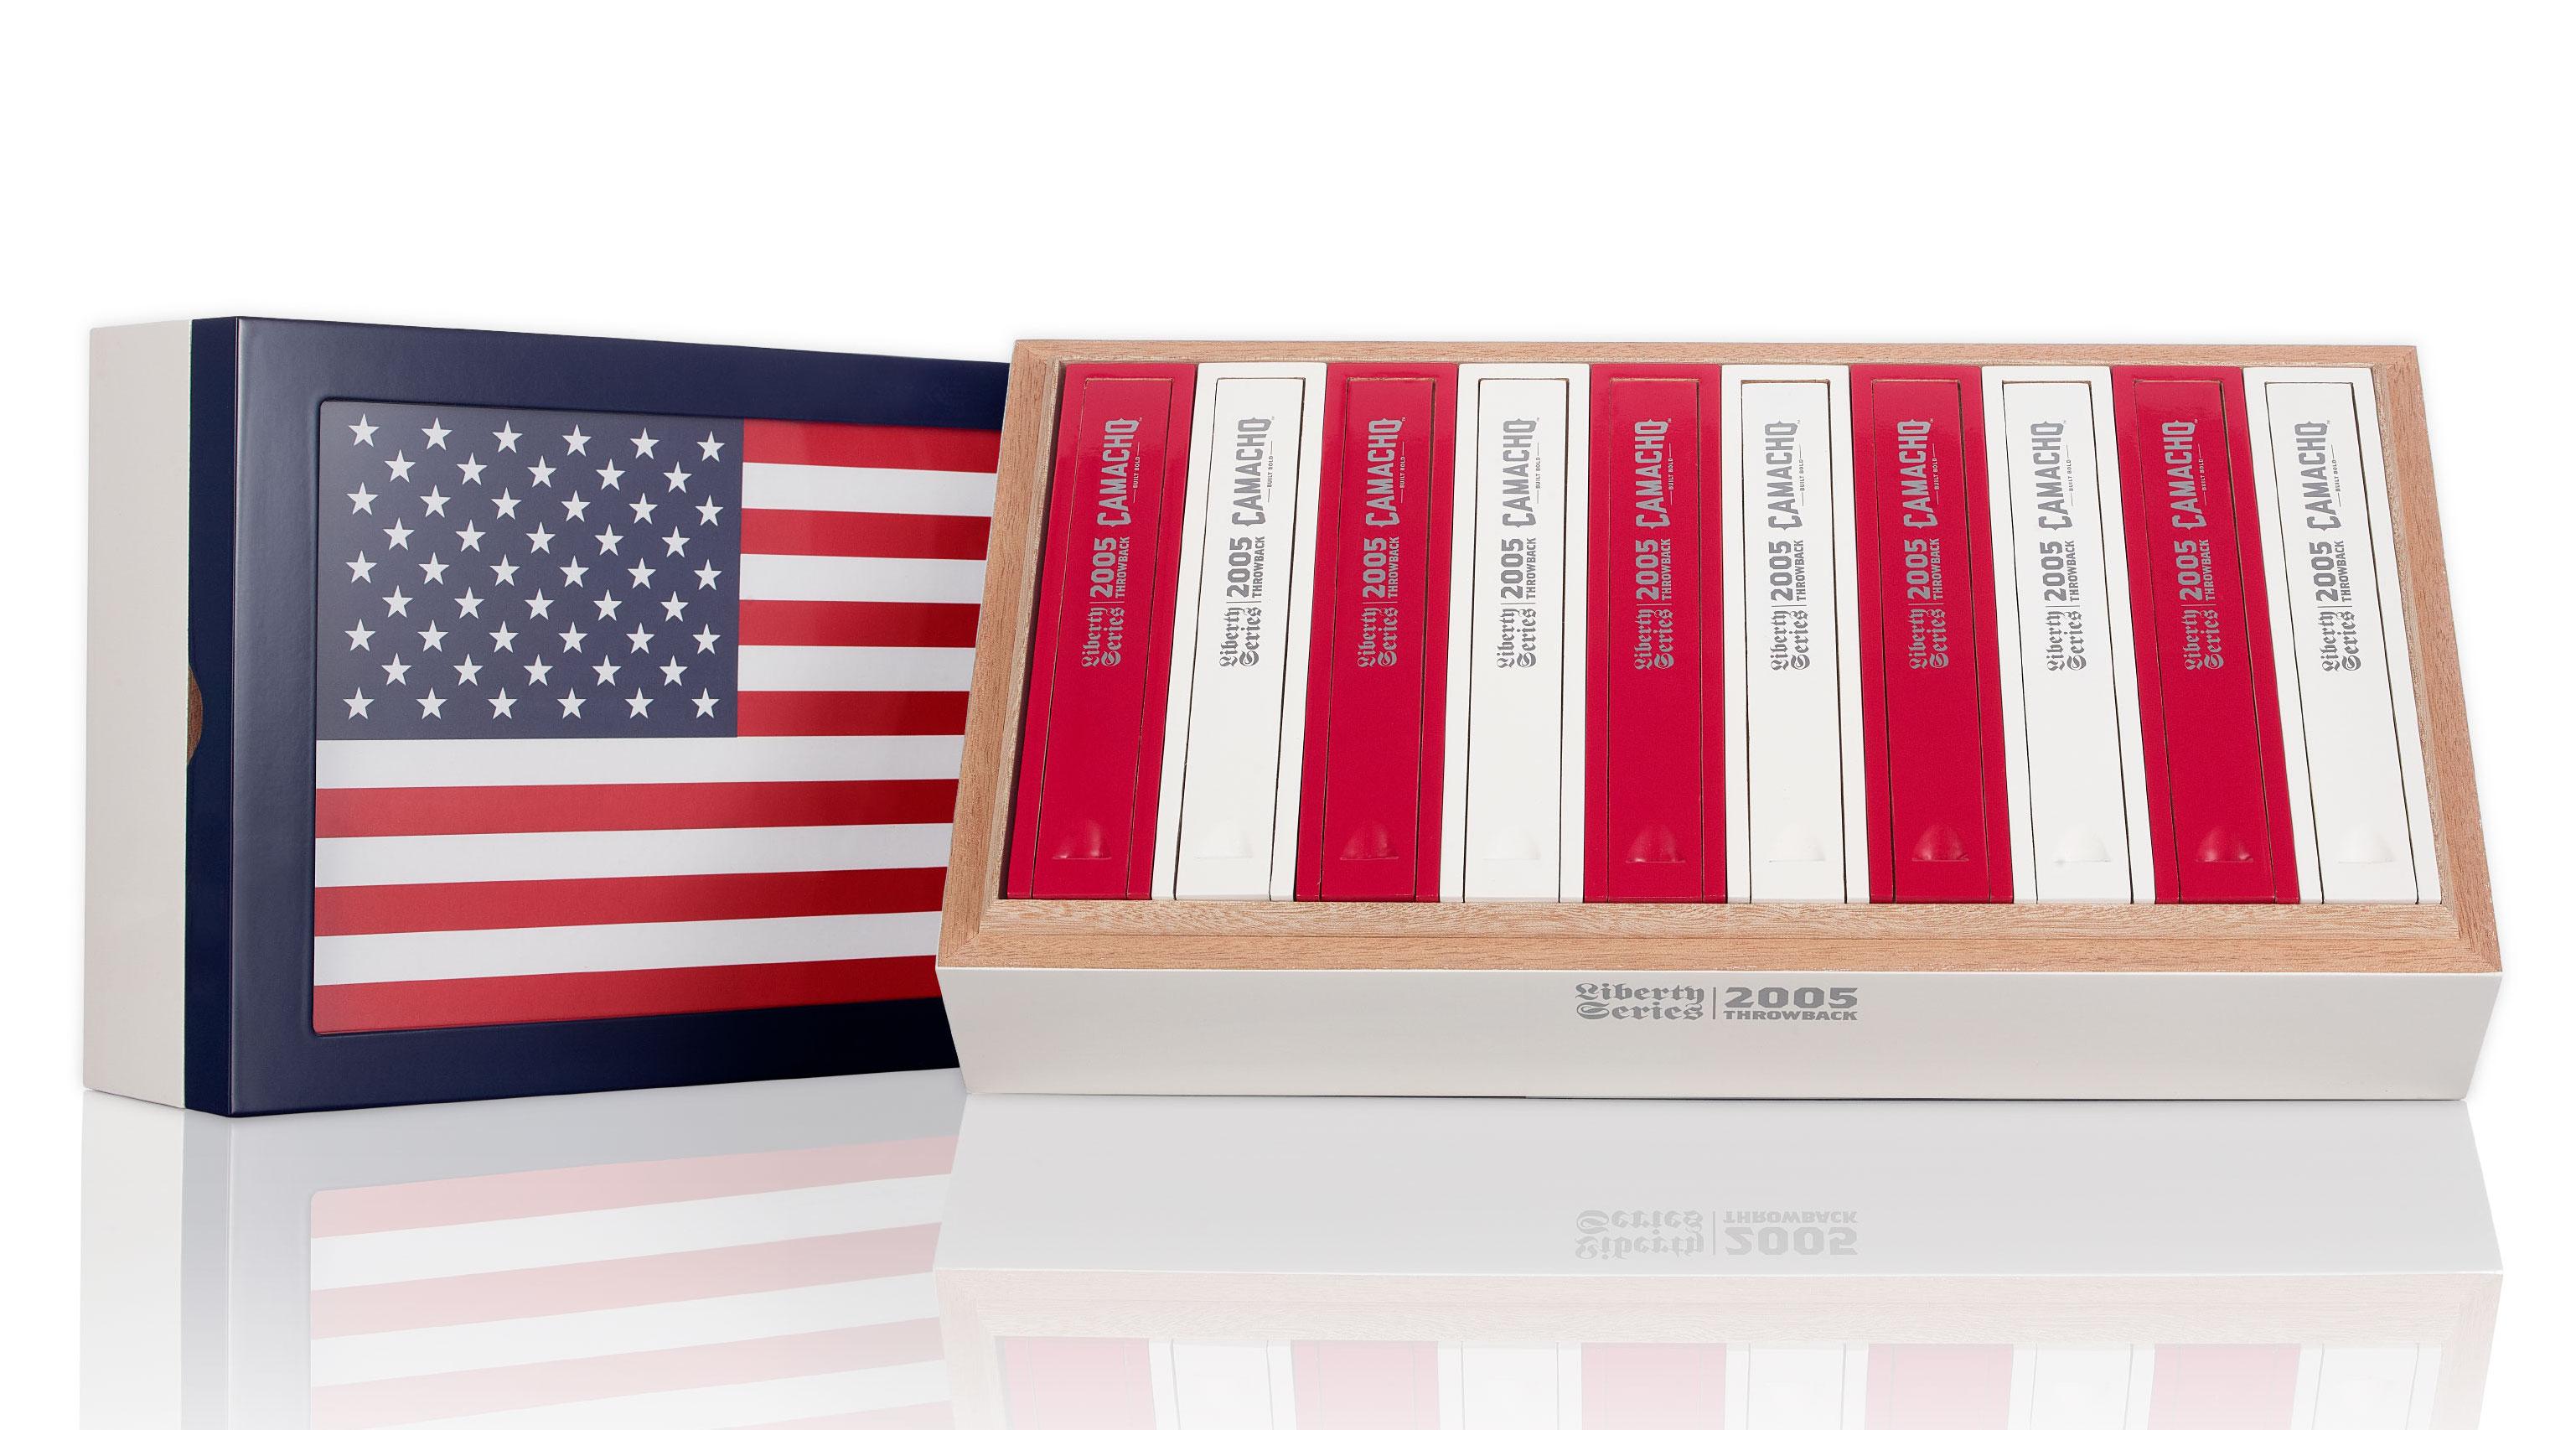 Cigar News: Camacho Liberty 2005 Throwback to be 2018 Installment of Liberty Series